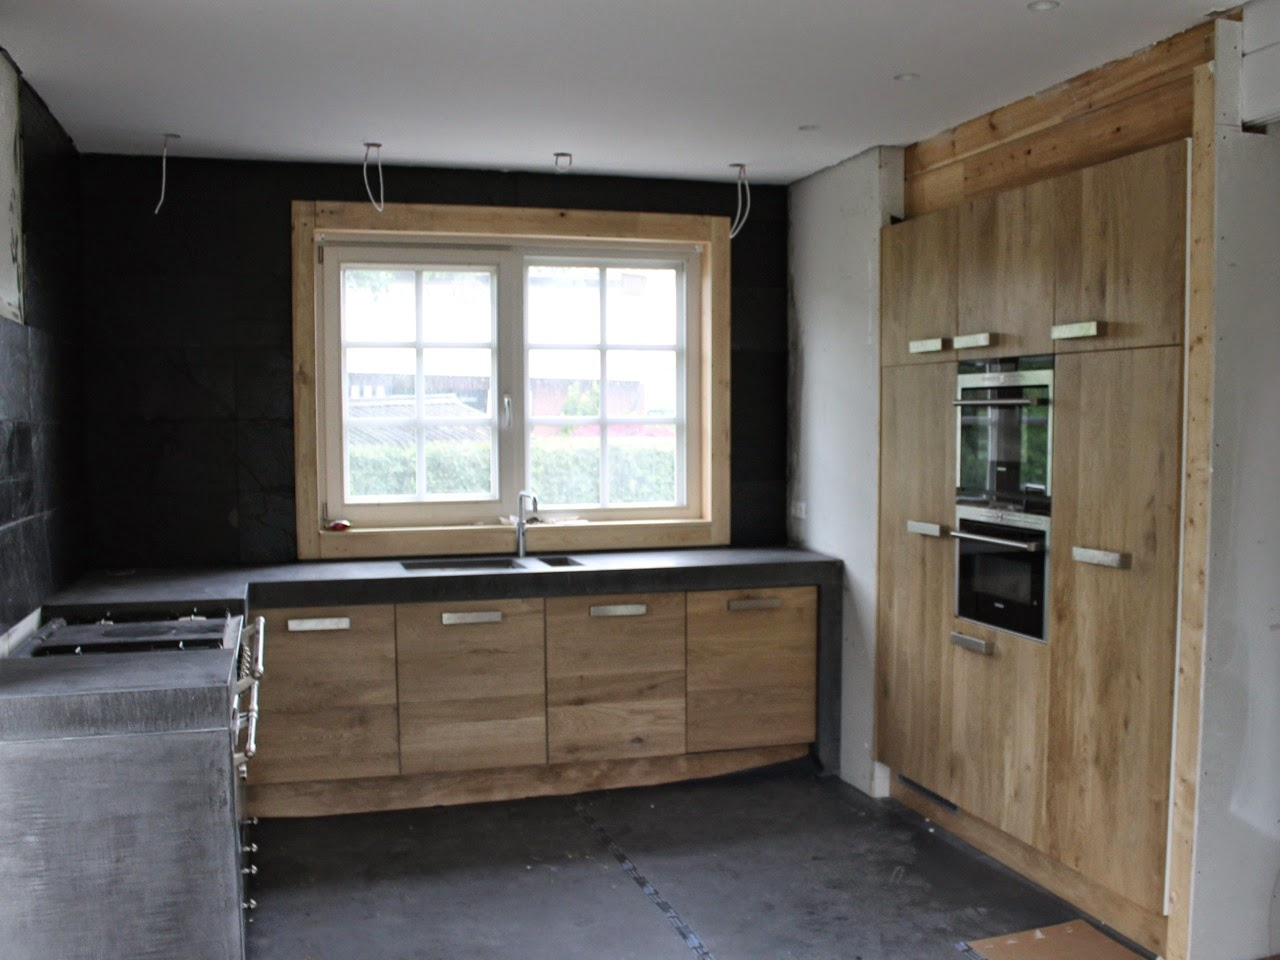 Ons nieuwe huis koak for Koak keuken